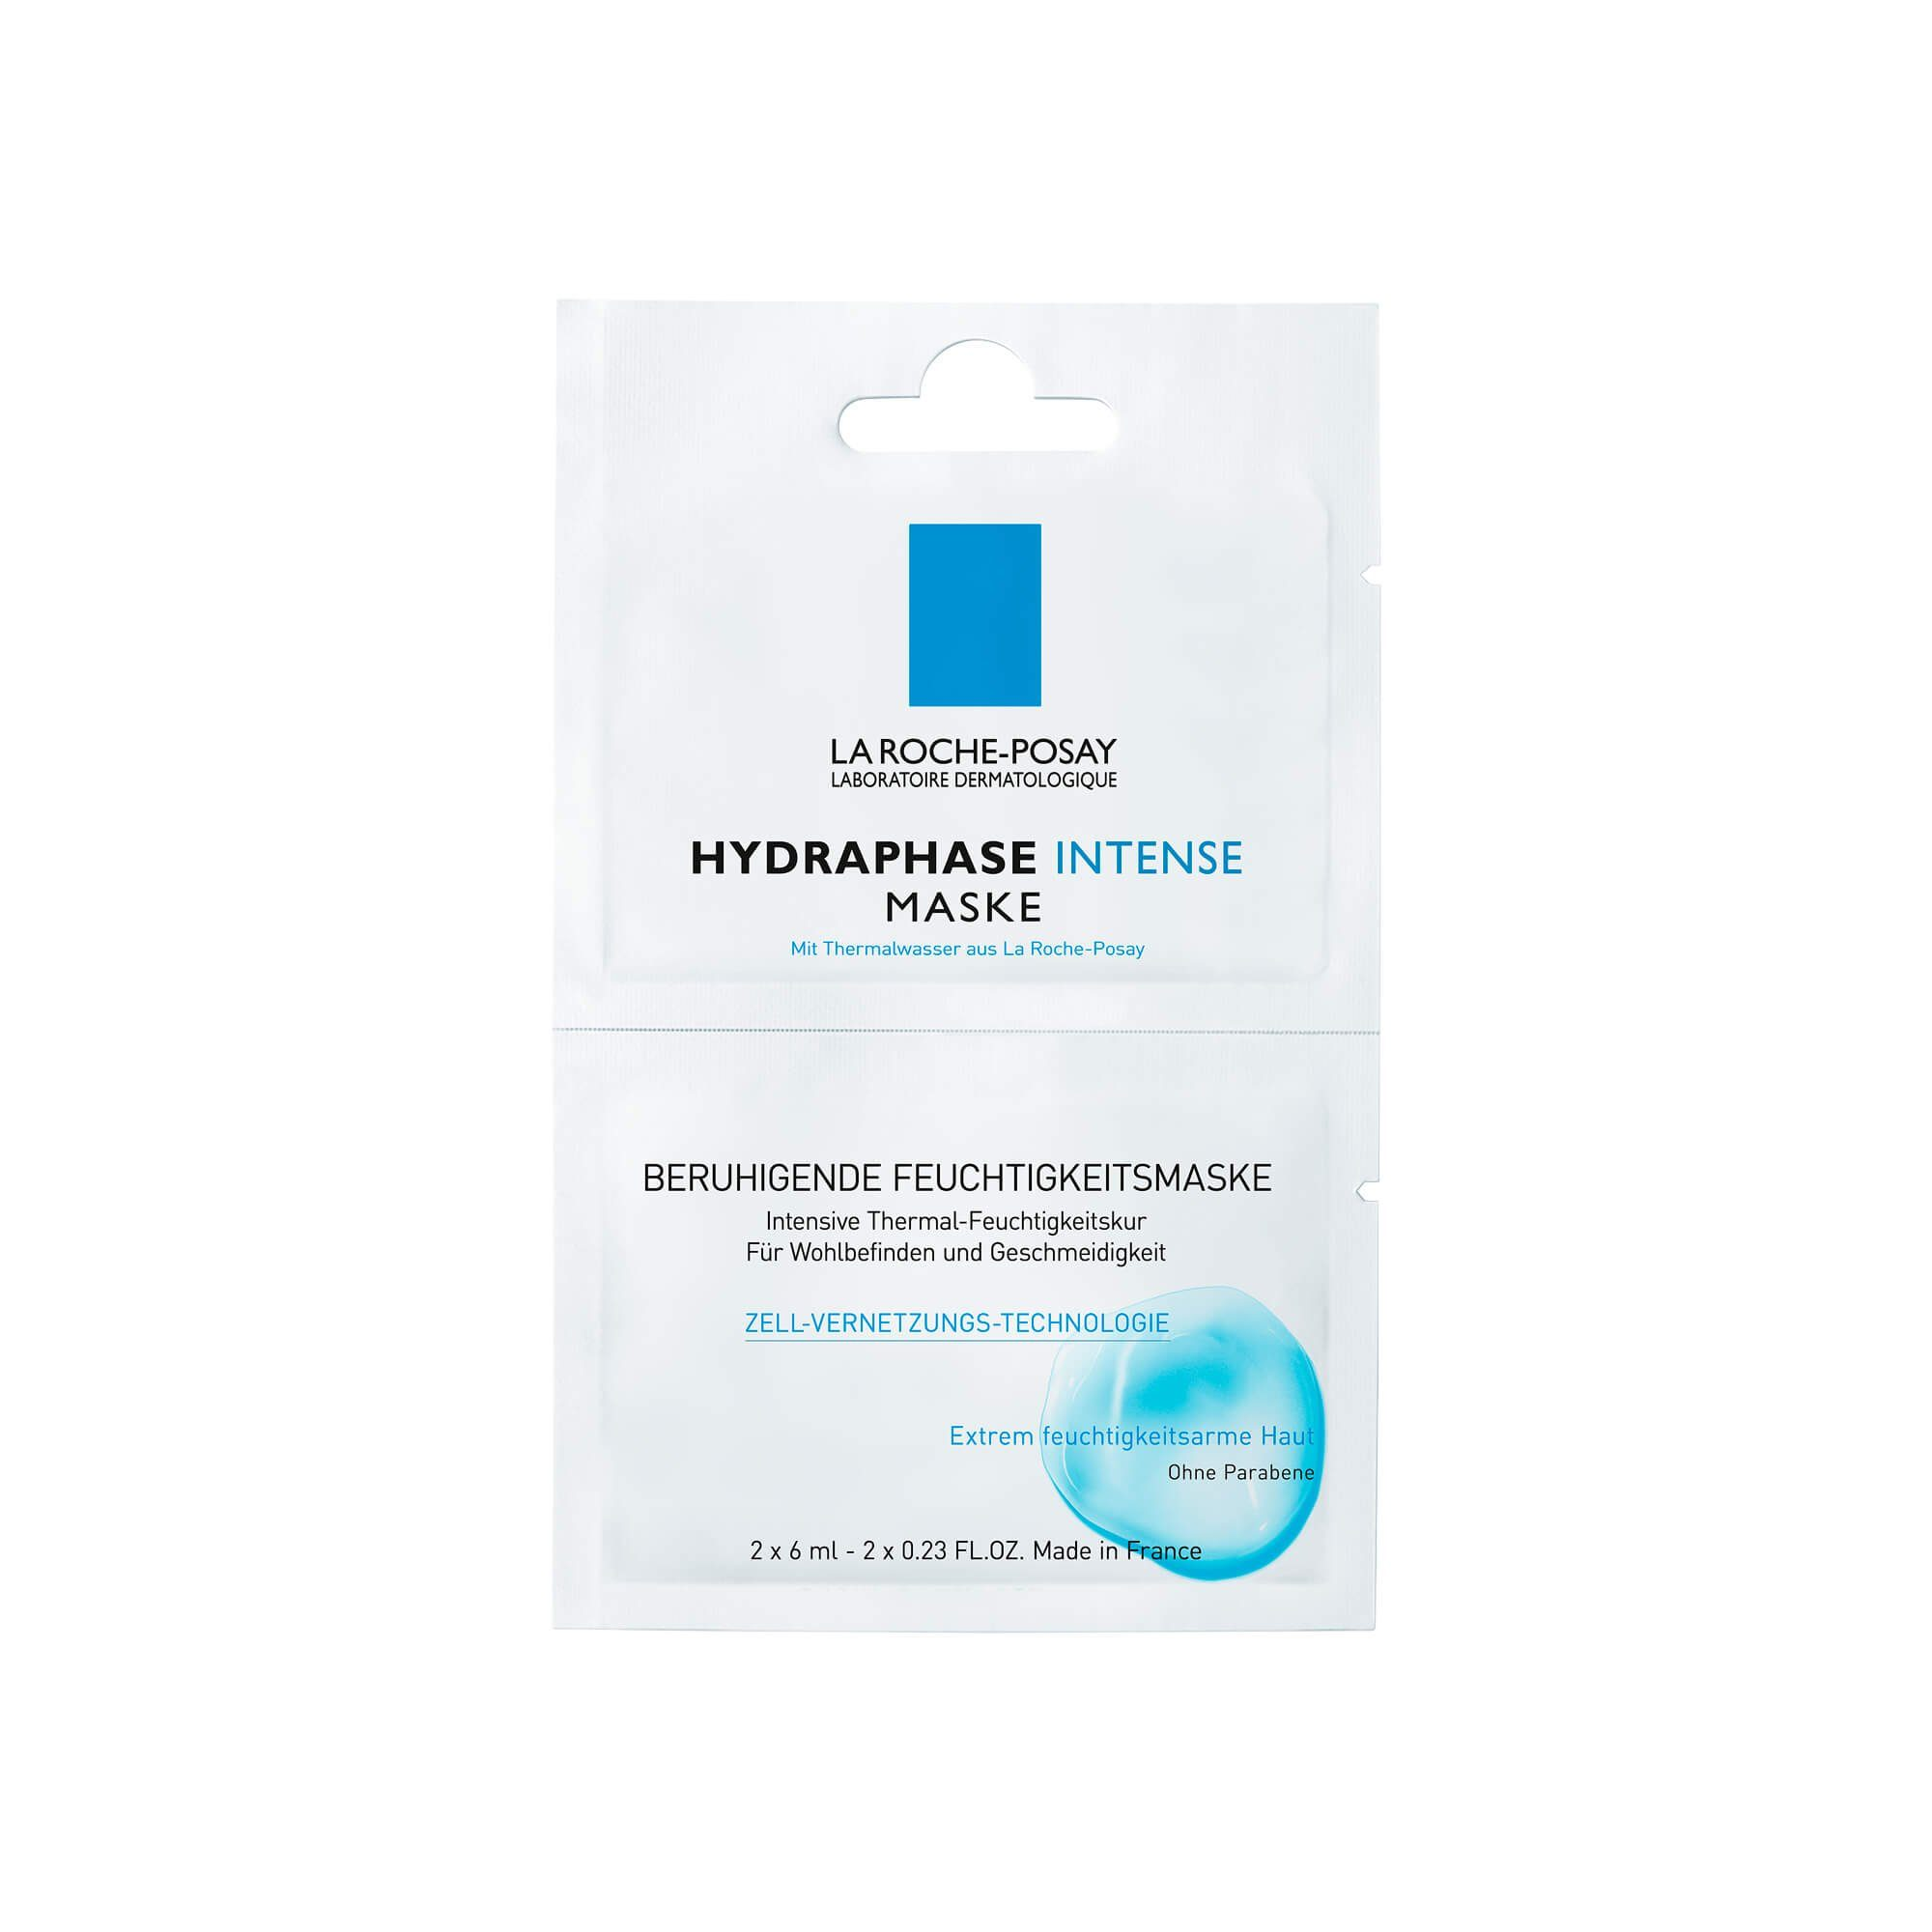 Roche Posay Hydraphase Maske, 2X6 ml